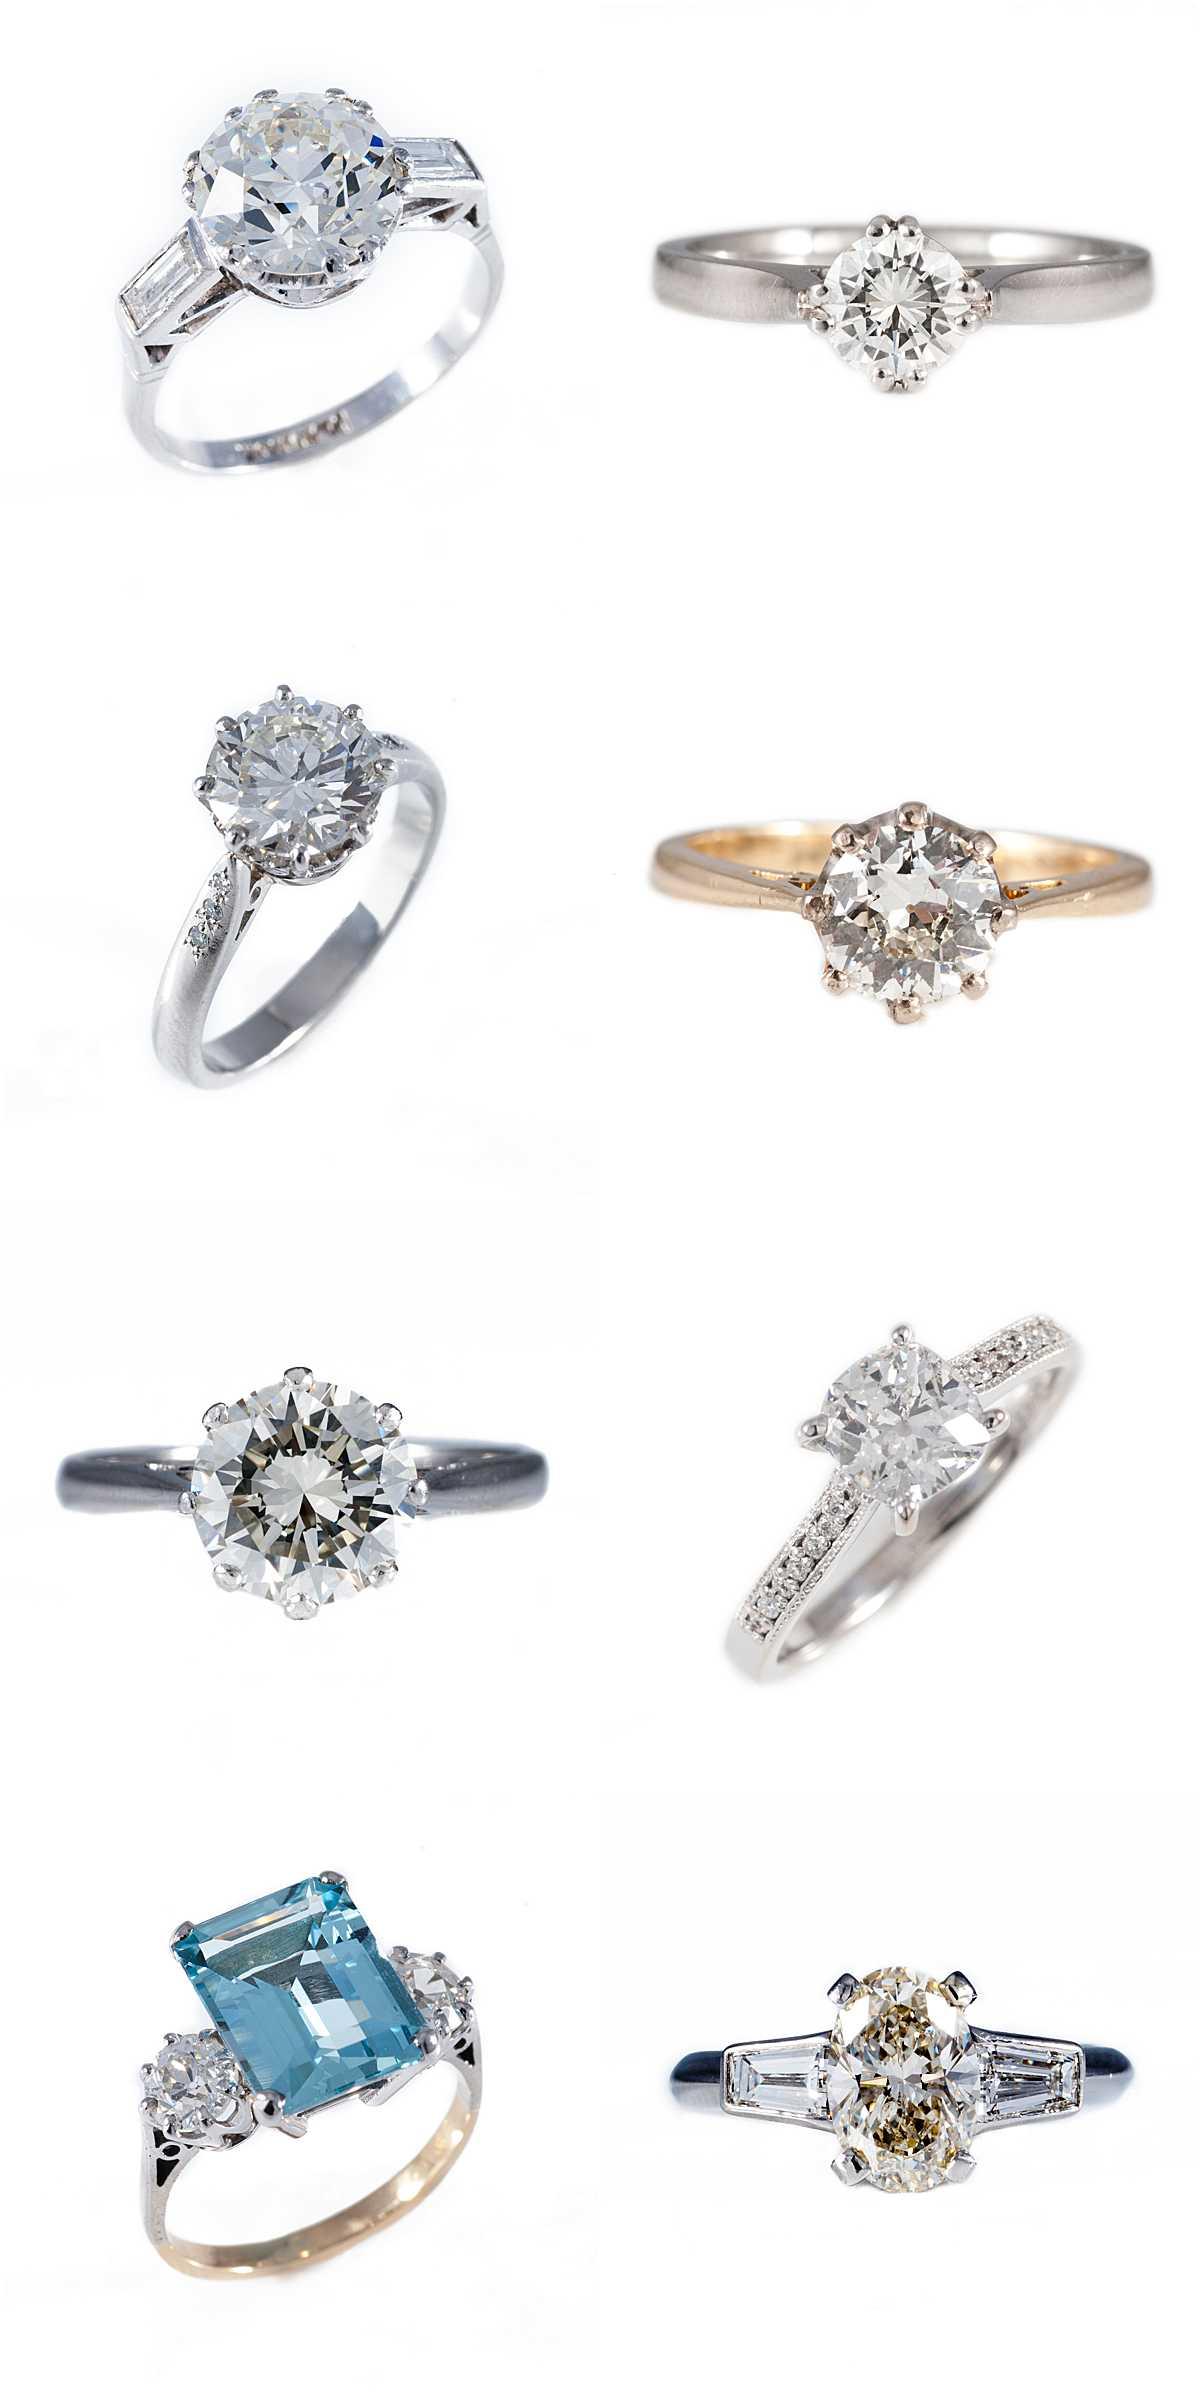 Sparkling Diamond Engagement Rings - Wedding Photography Edinburgh